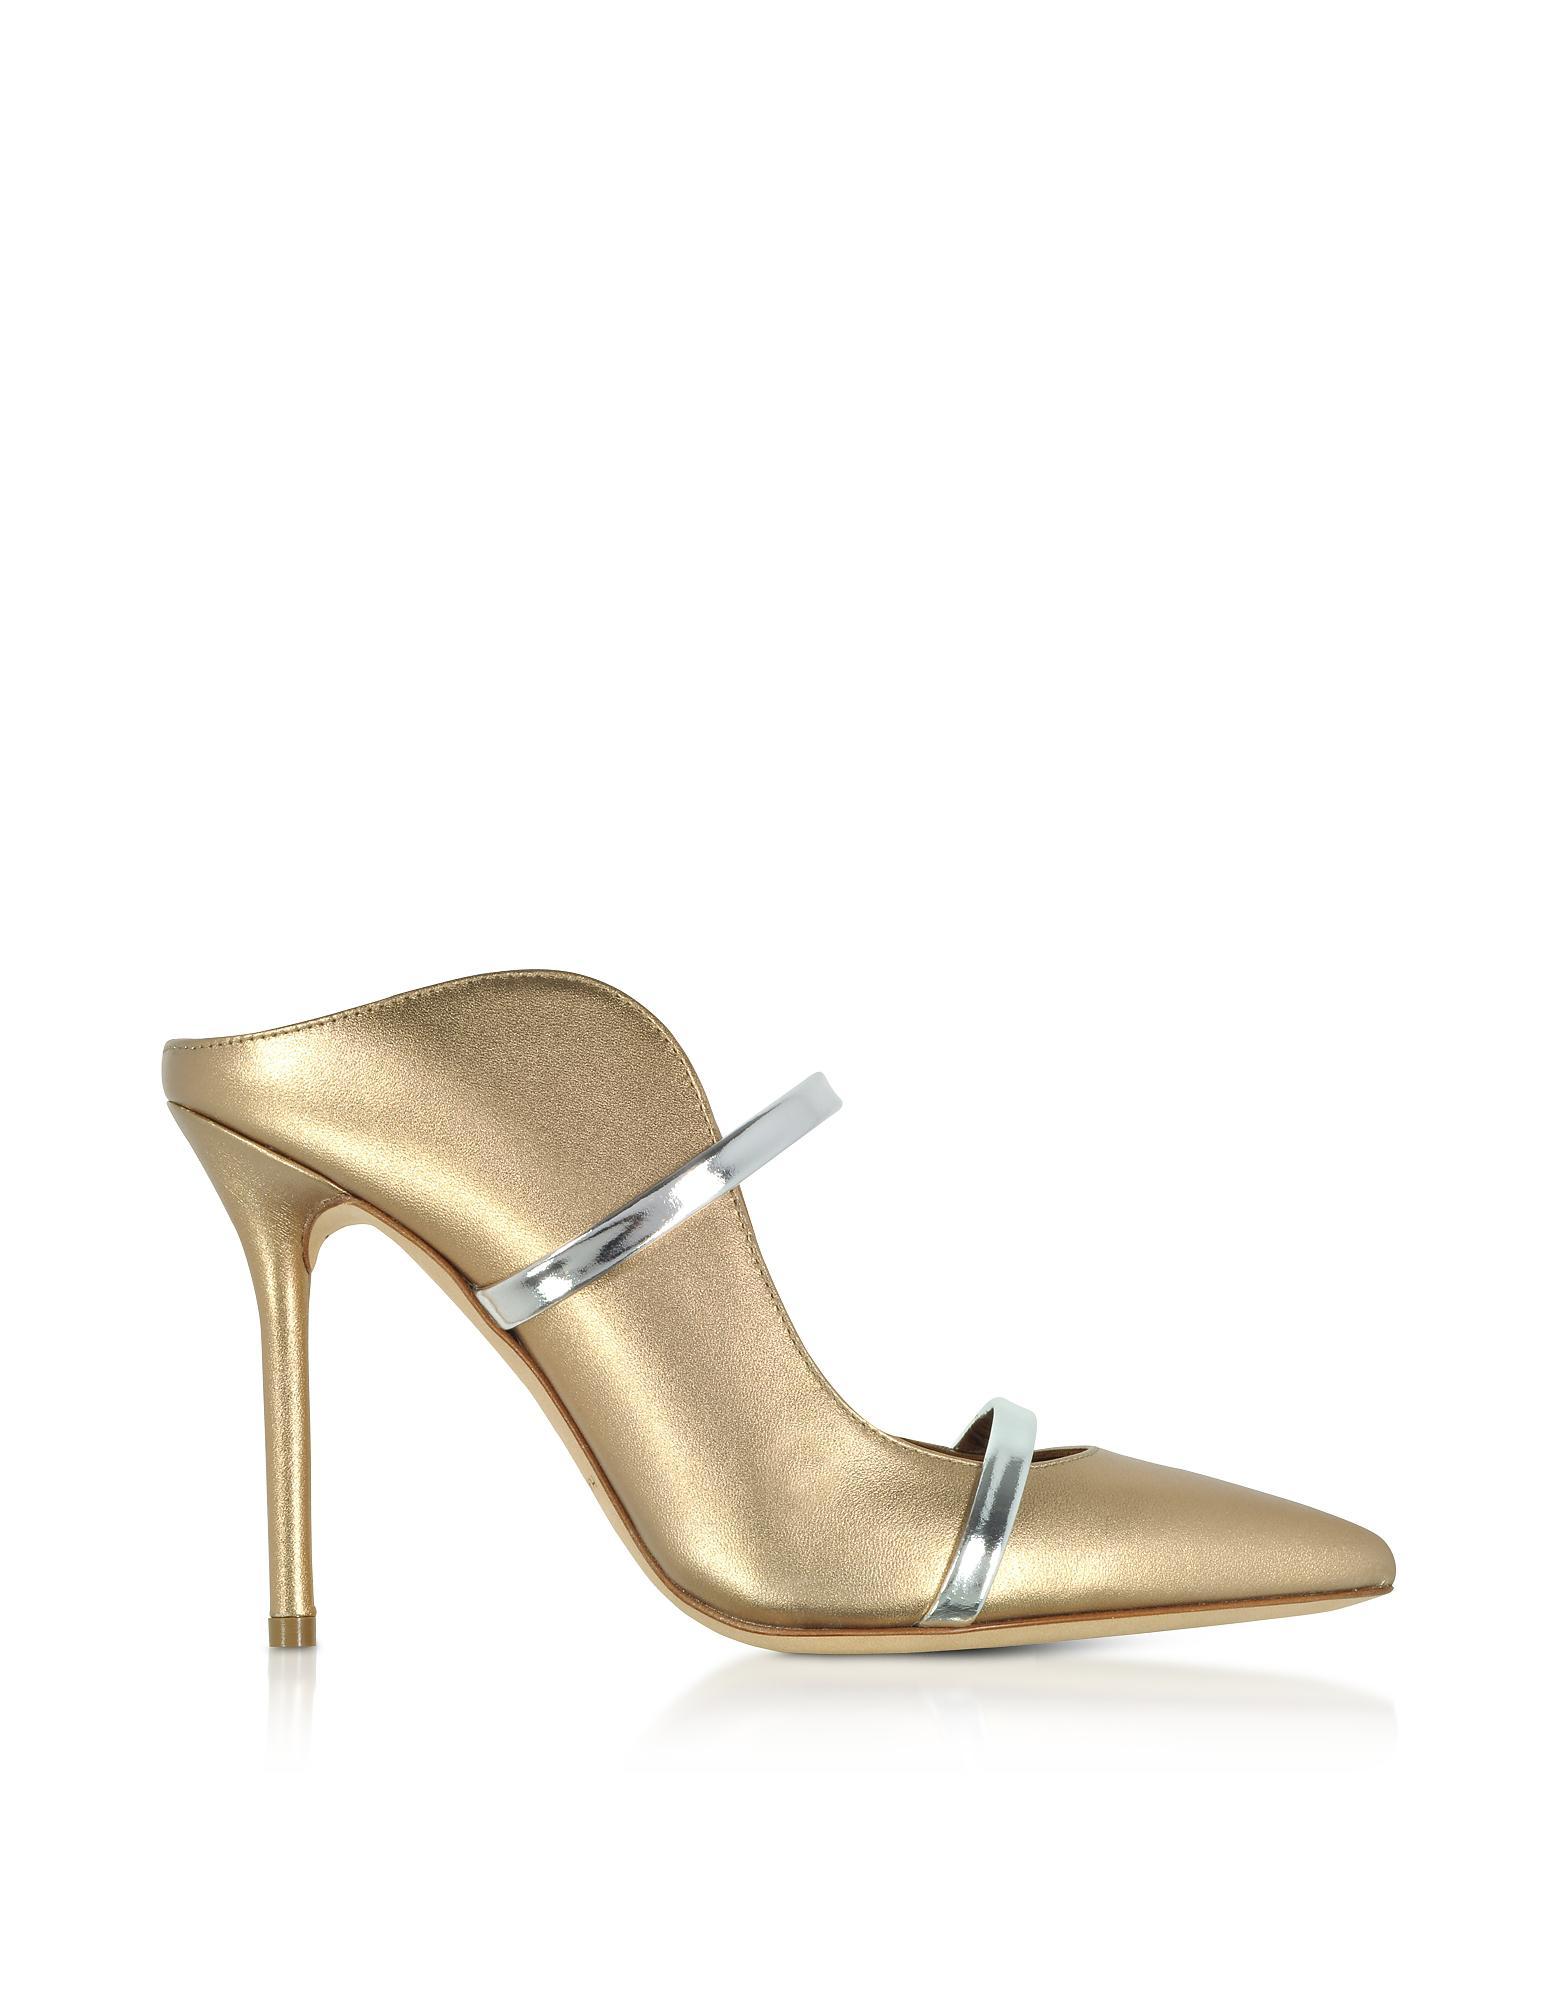 a74d76b34c Malone Souliers Gold/silver Metallic Nappa Leather Maureen High Heel ...